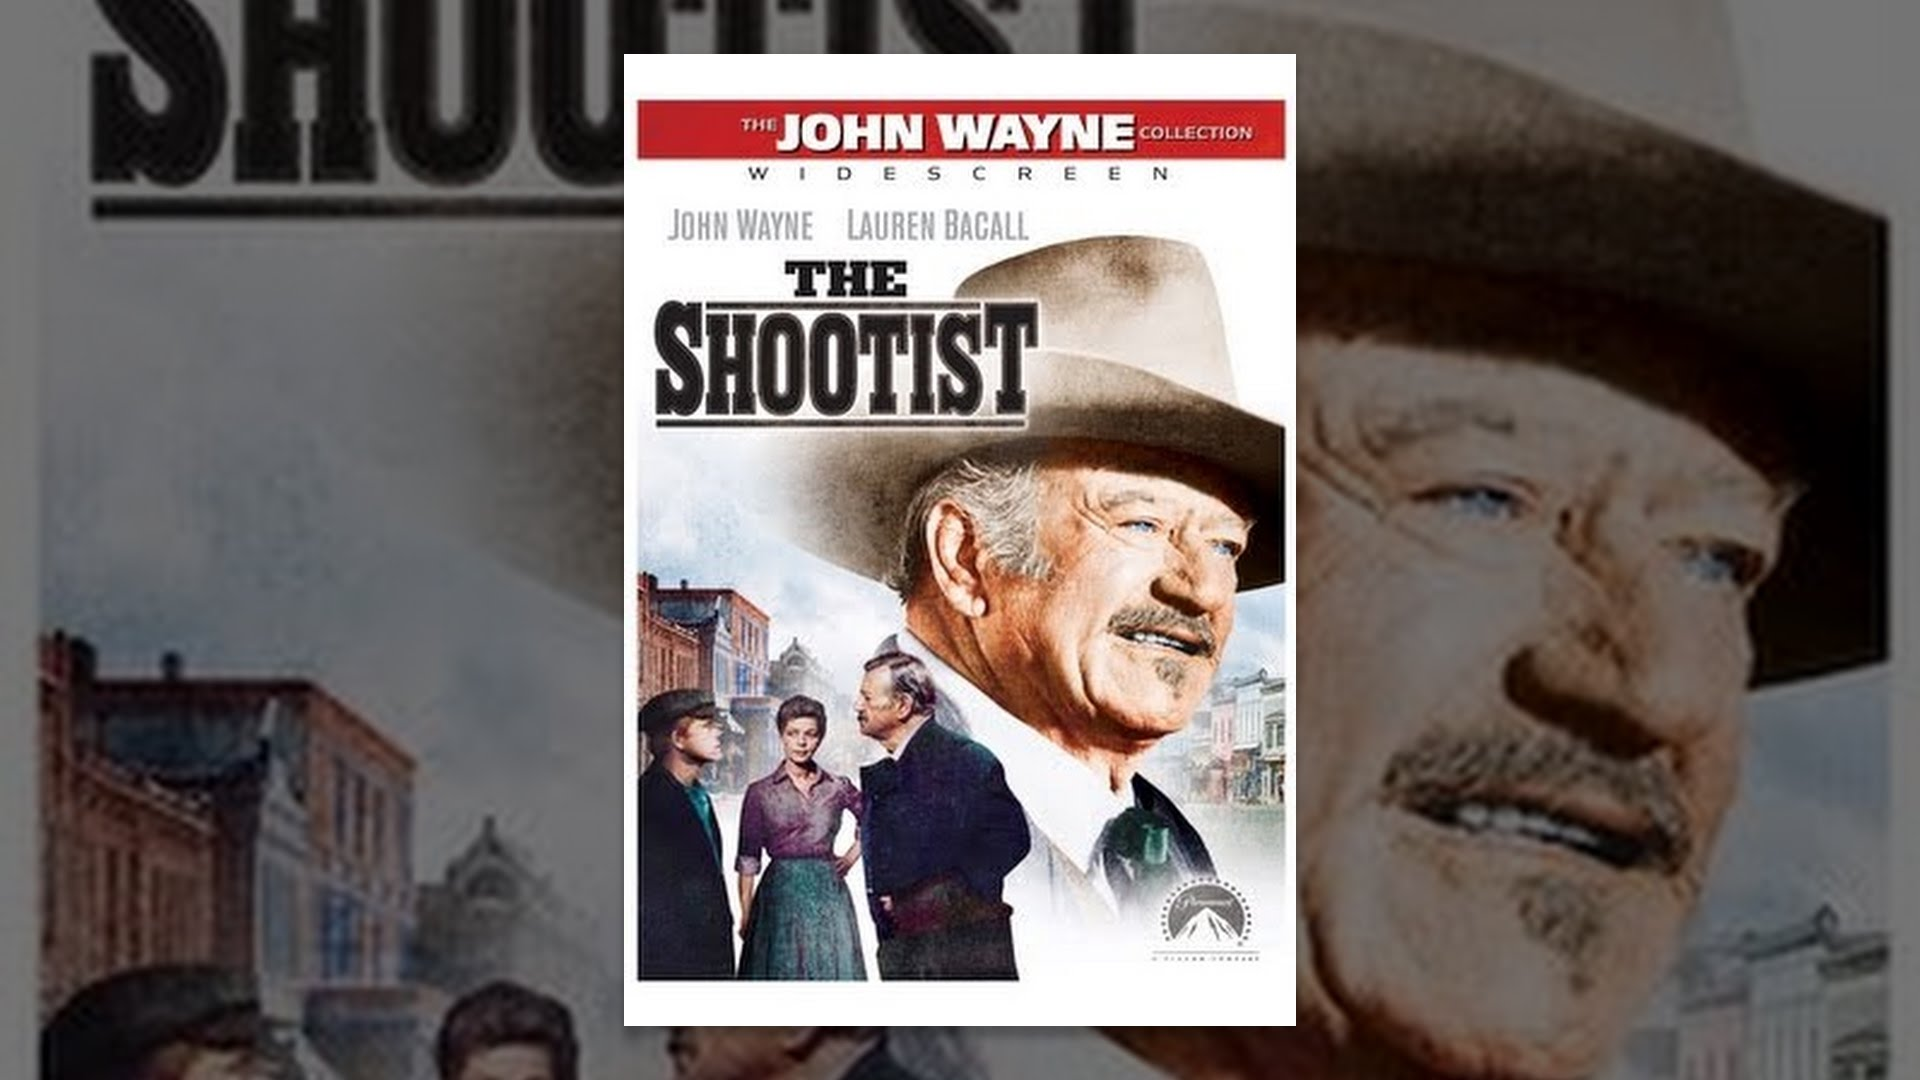 The Shootist - YouTube